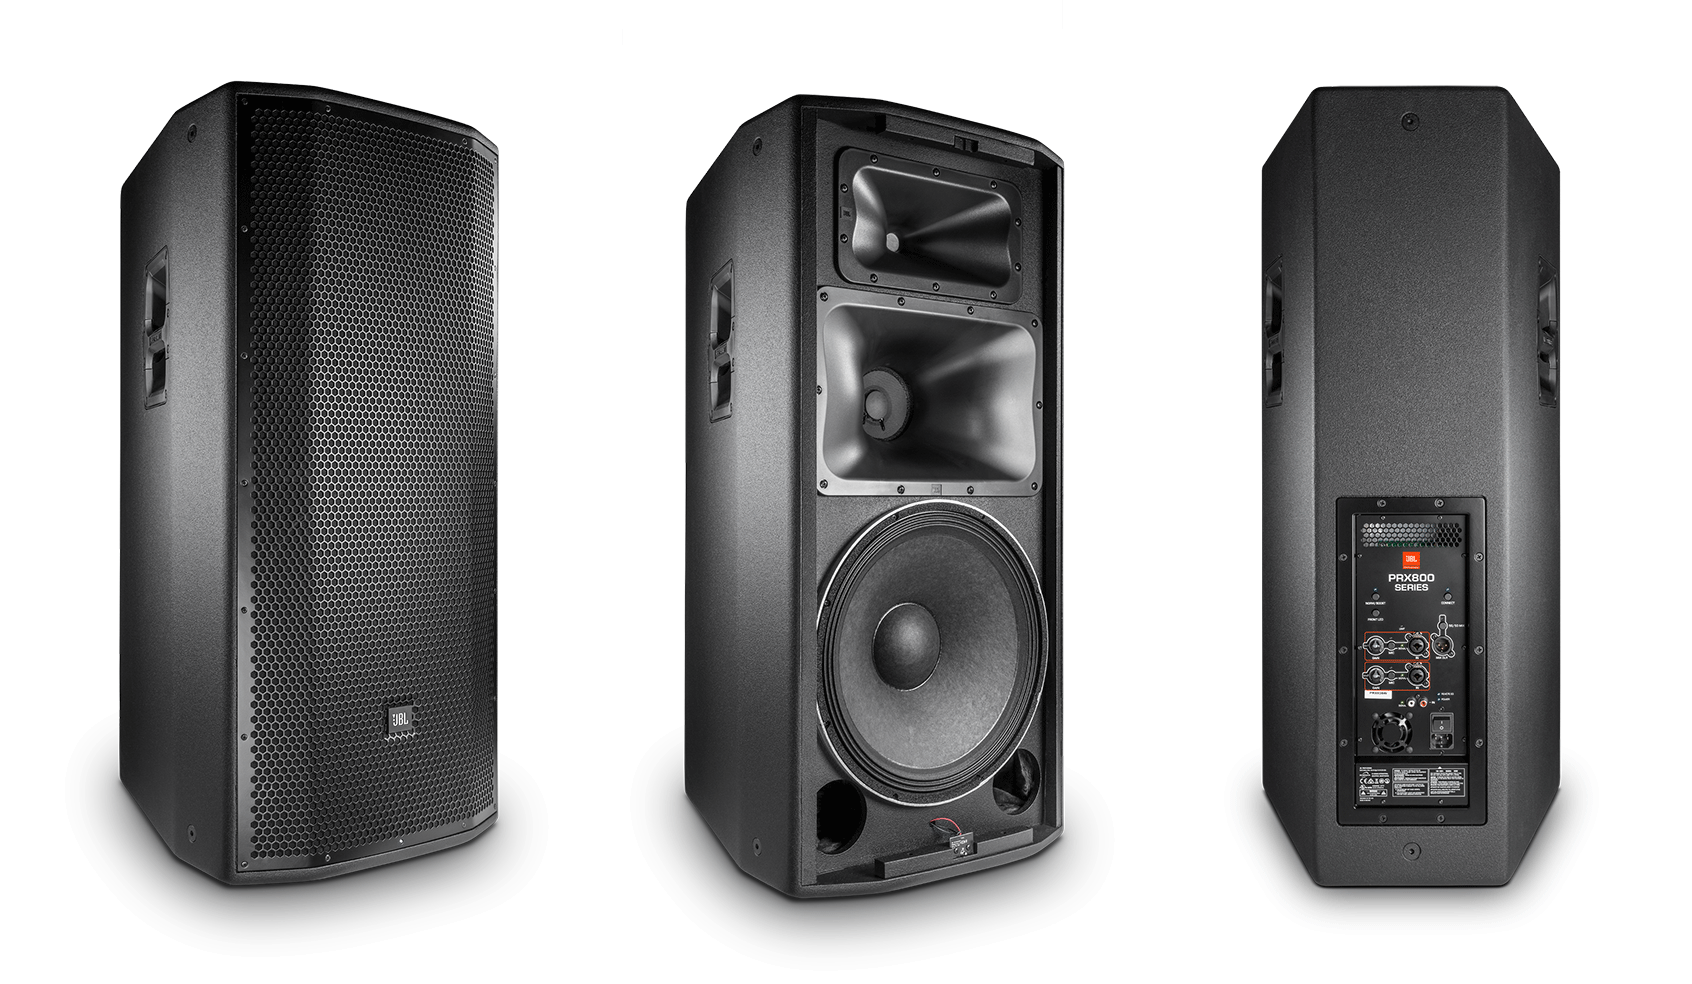 Loa sân khấu Active cao cấp JBL PRX835W | Anh Duy Audio